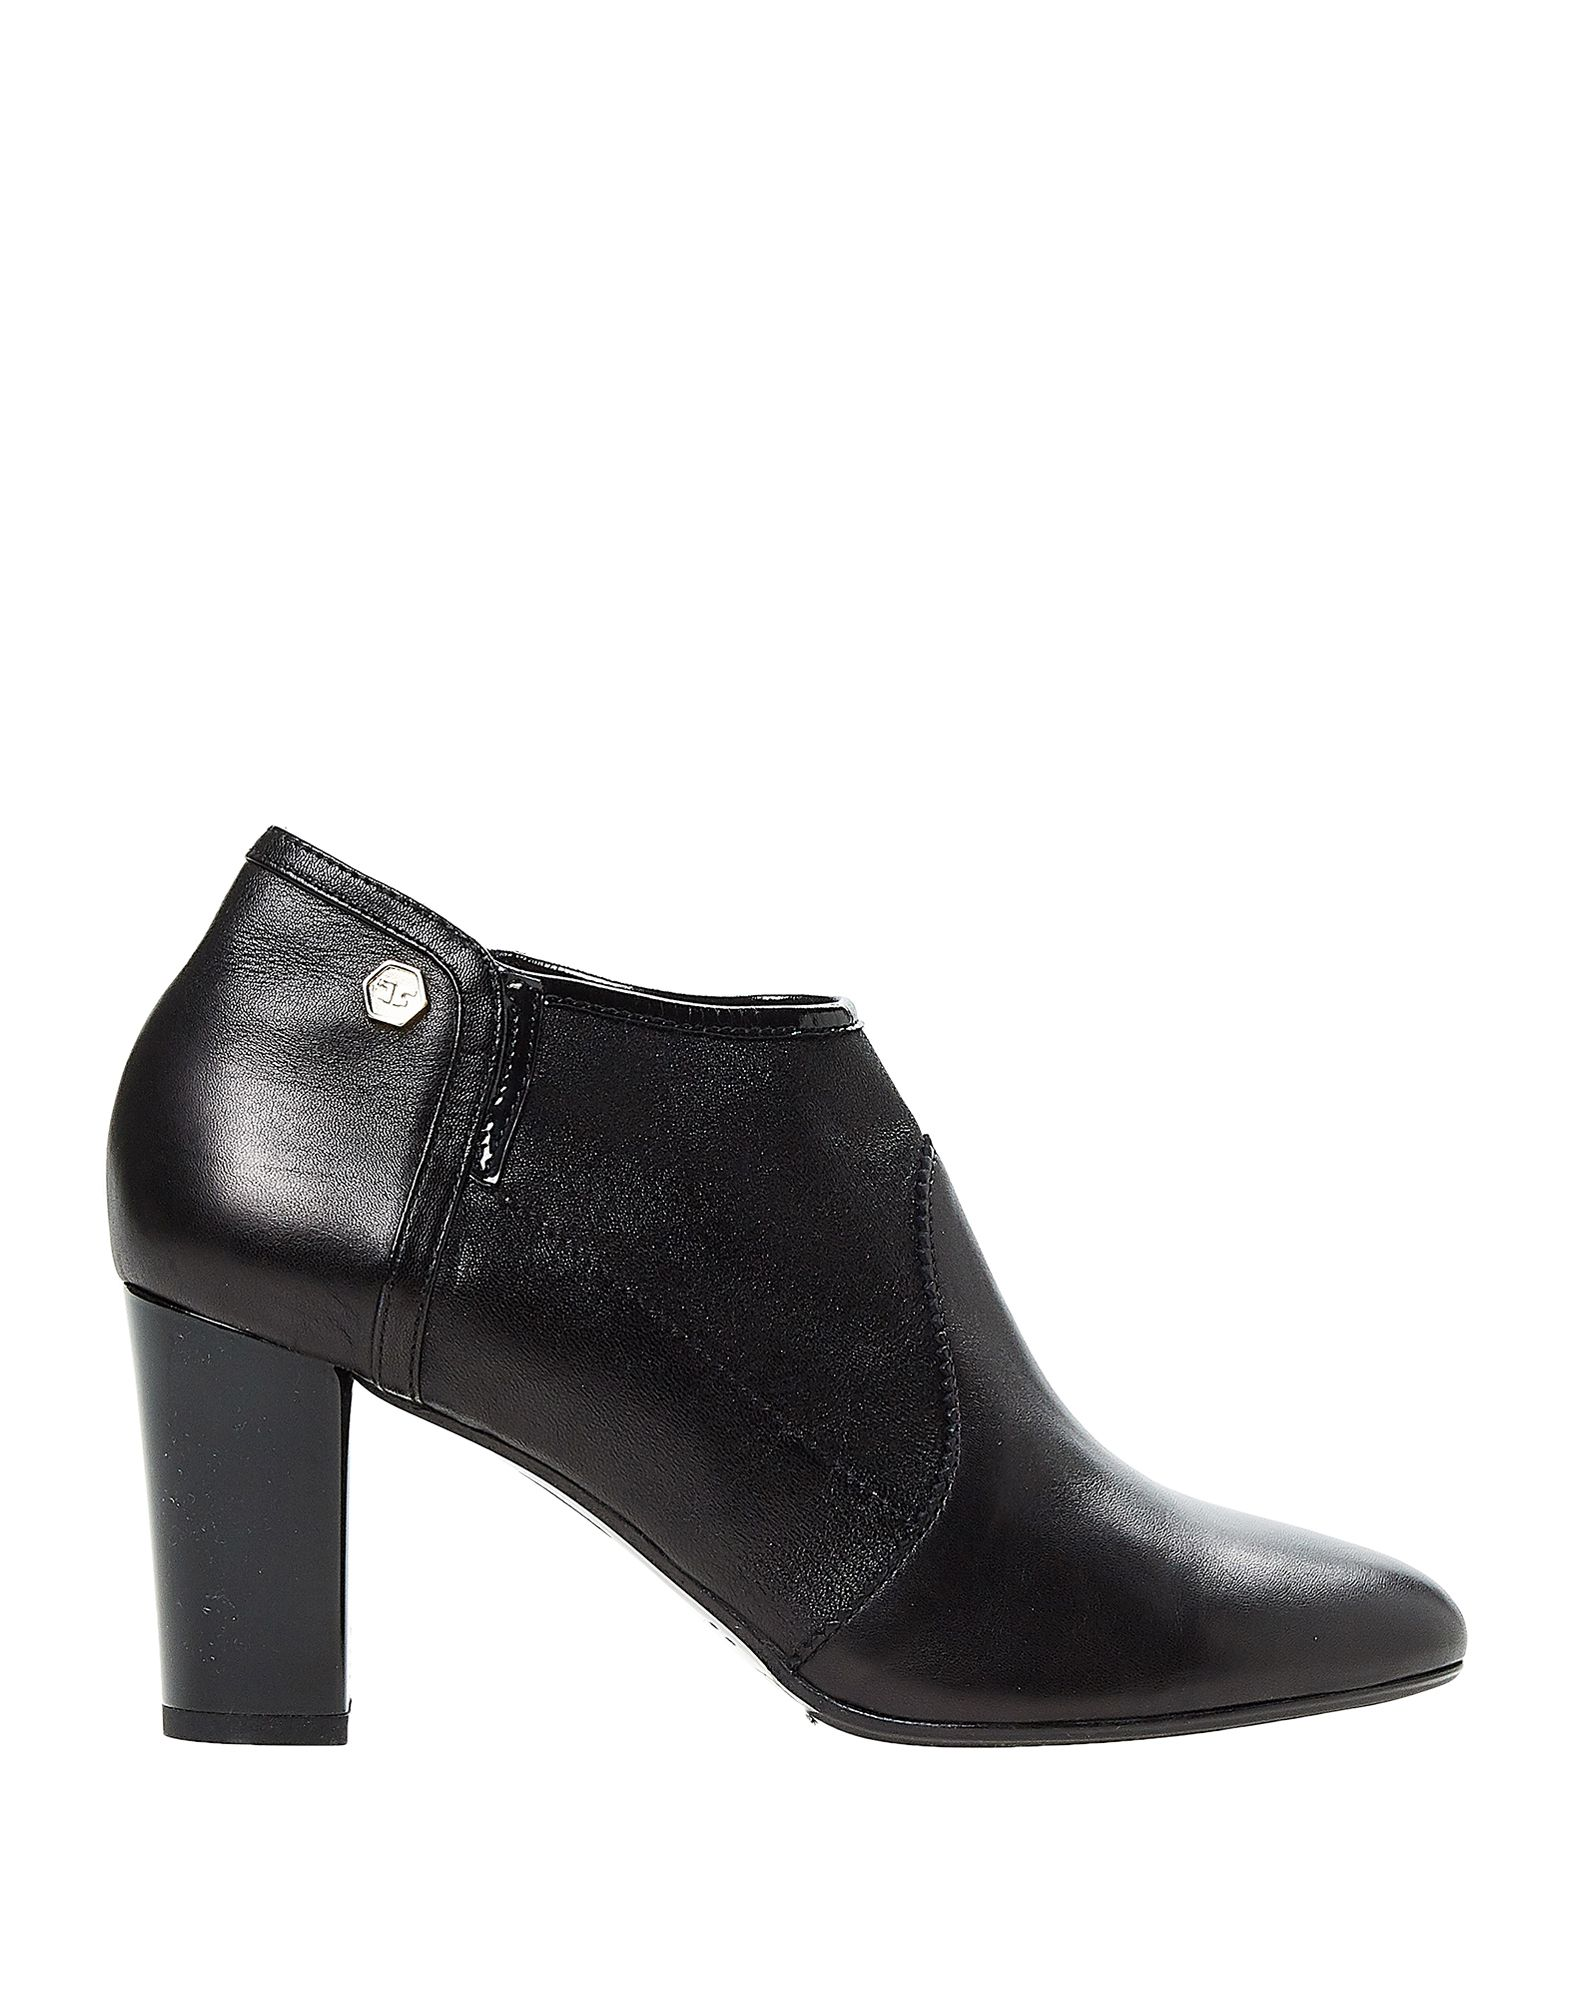 FIORANGELO Ботинки fiorangelo сандалии